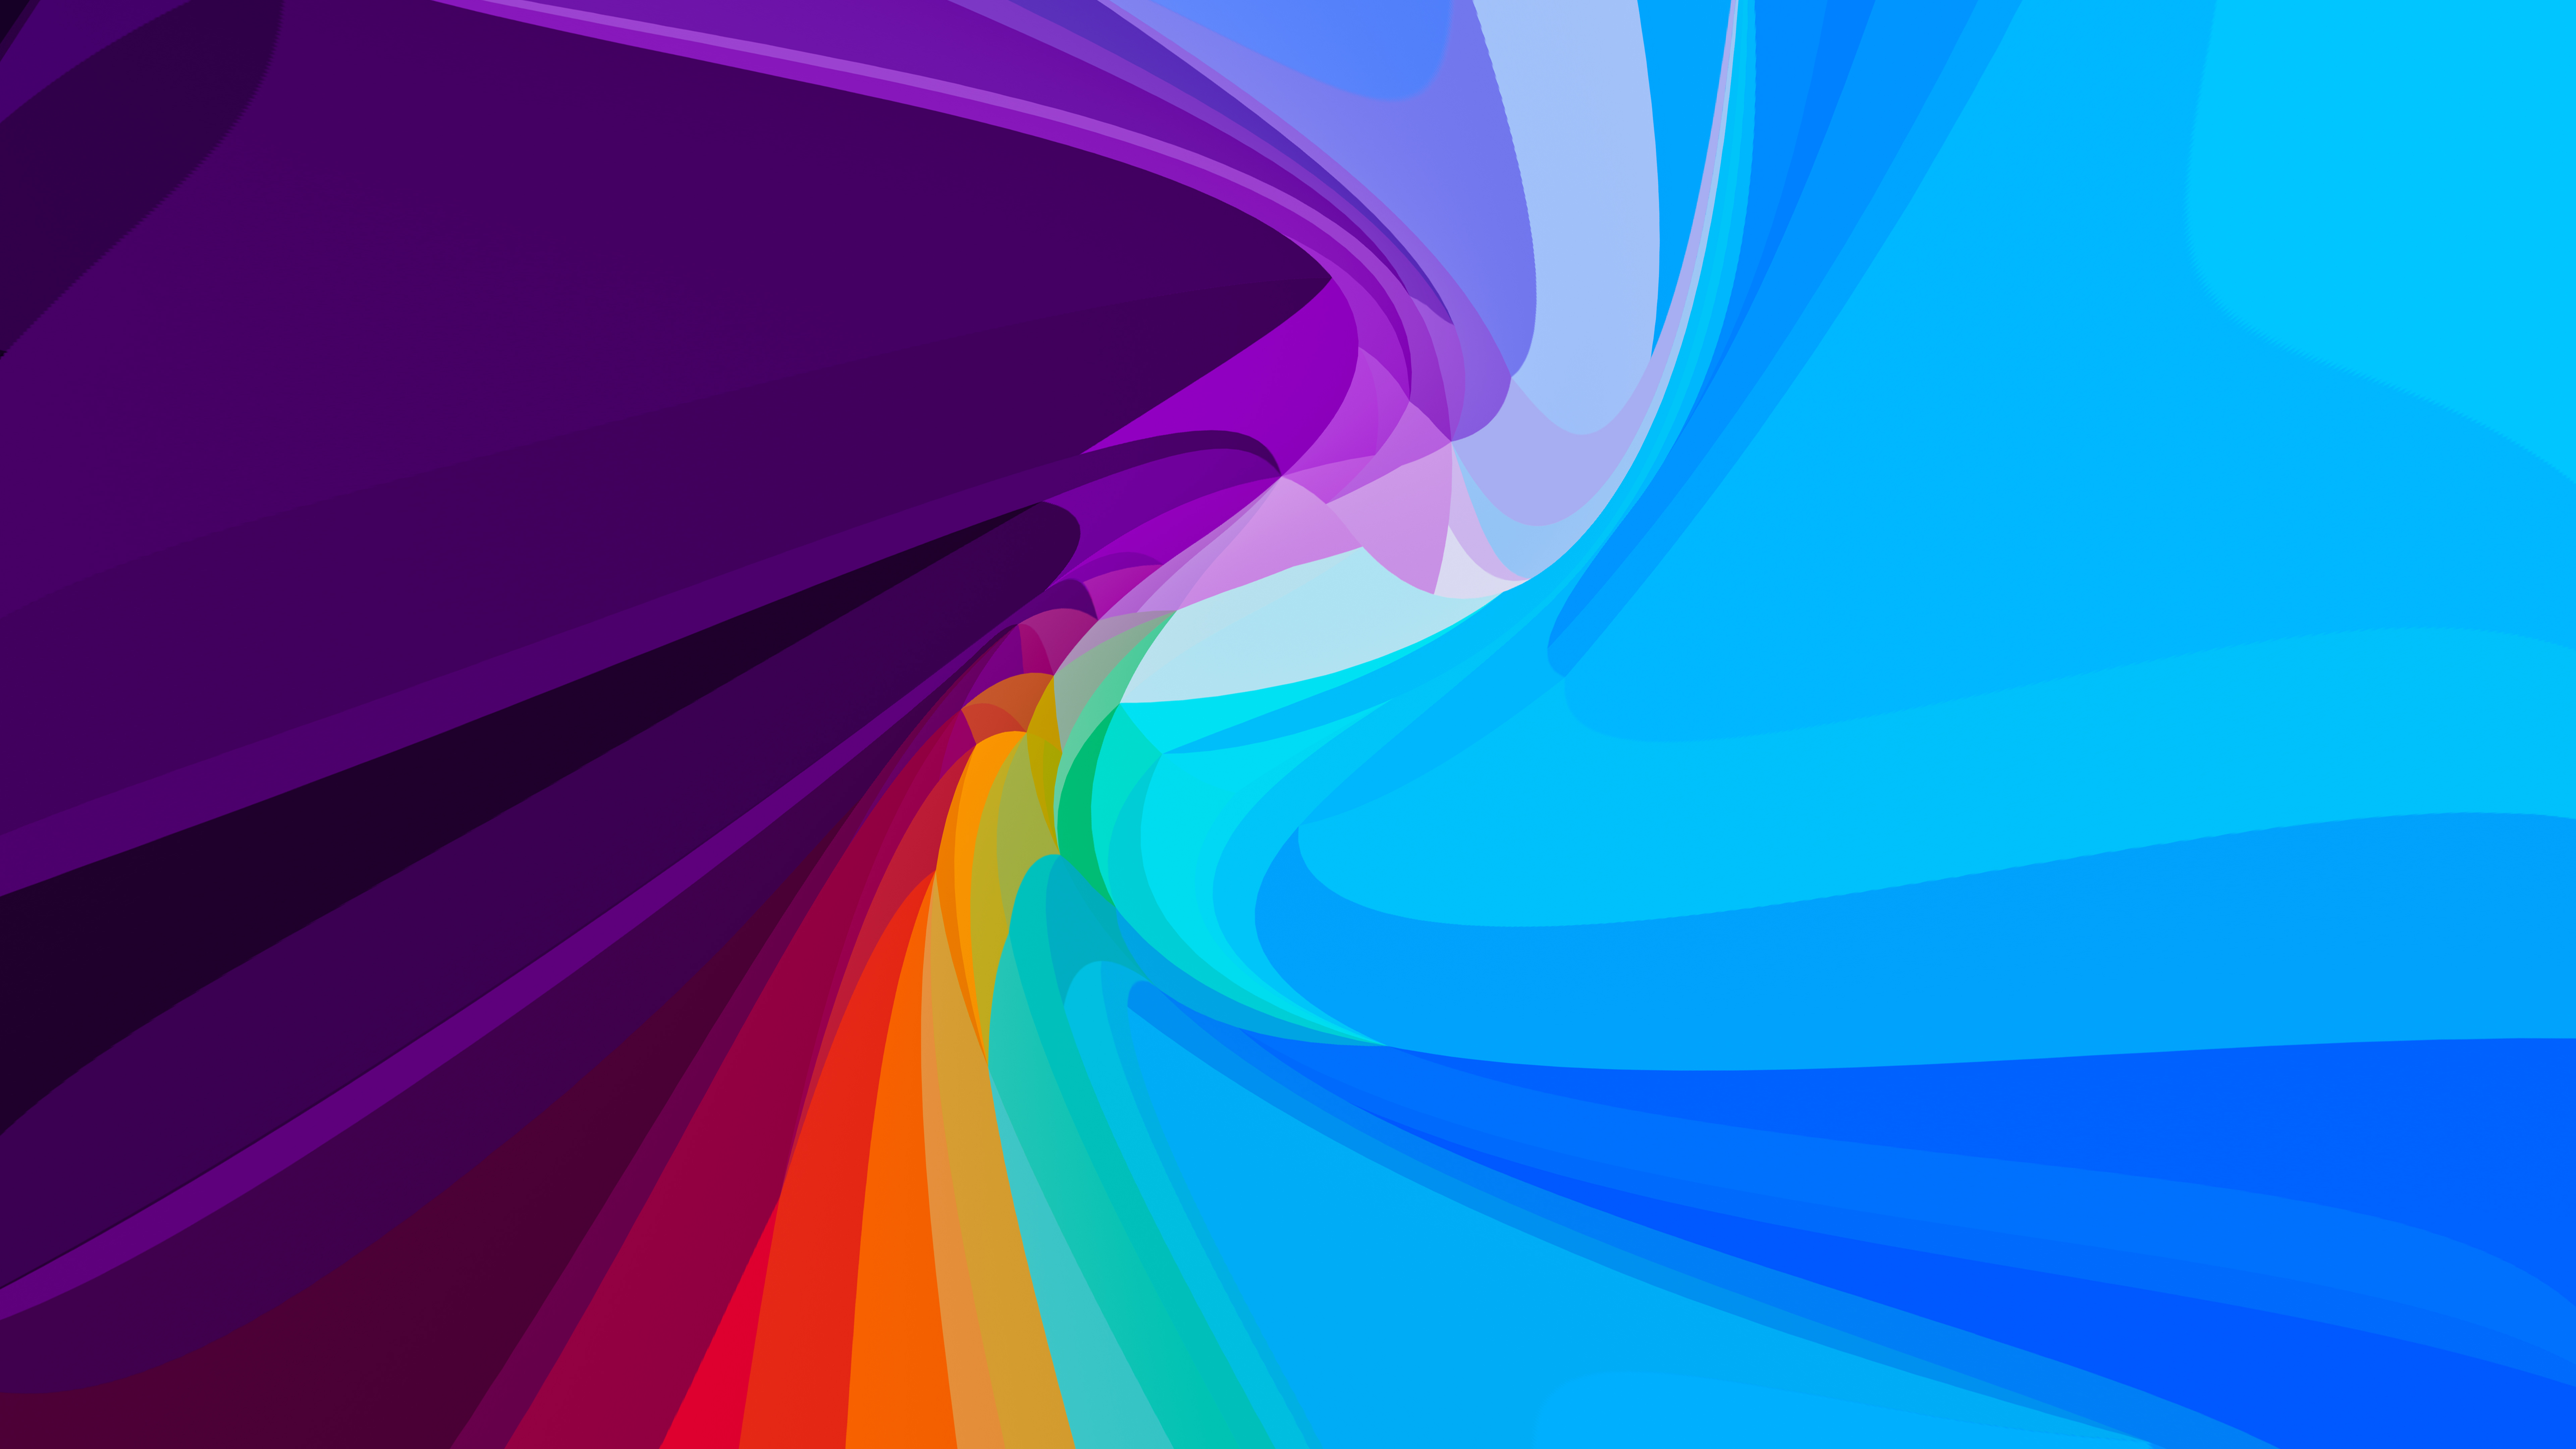 Fondos de pantalla Colores unidos